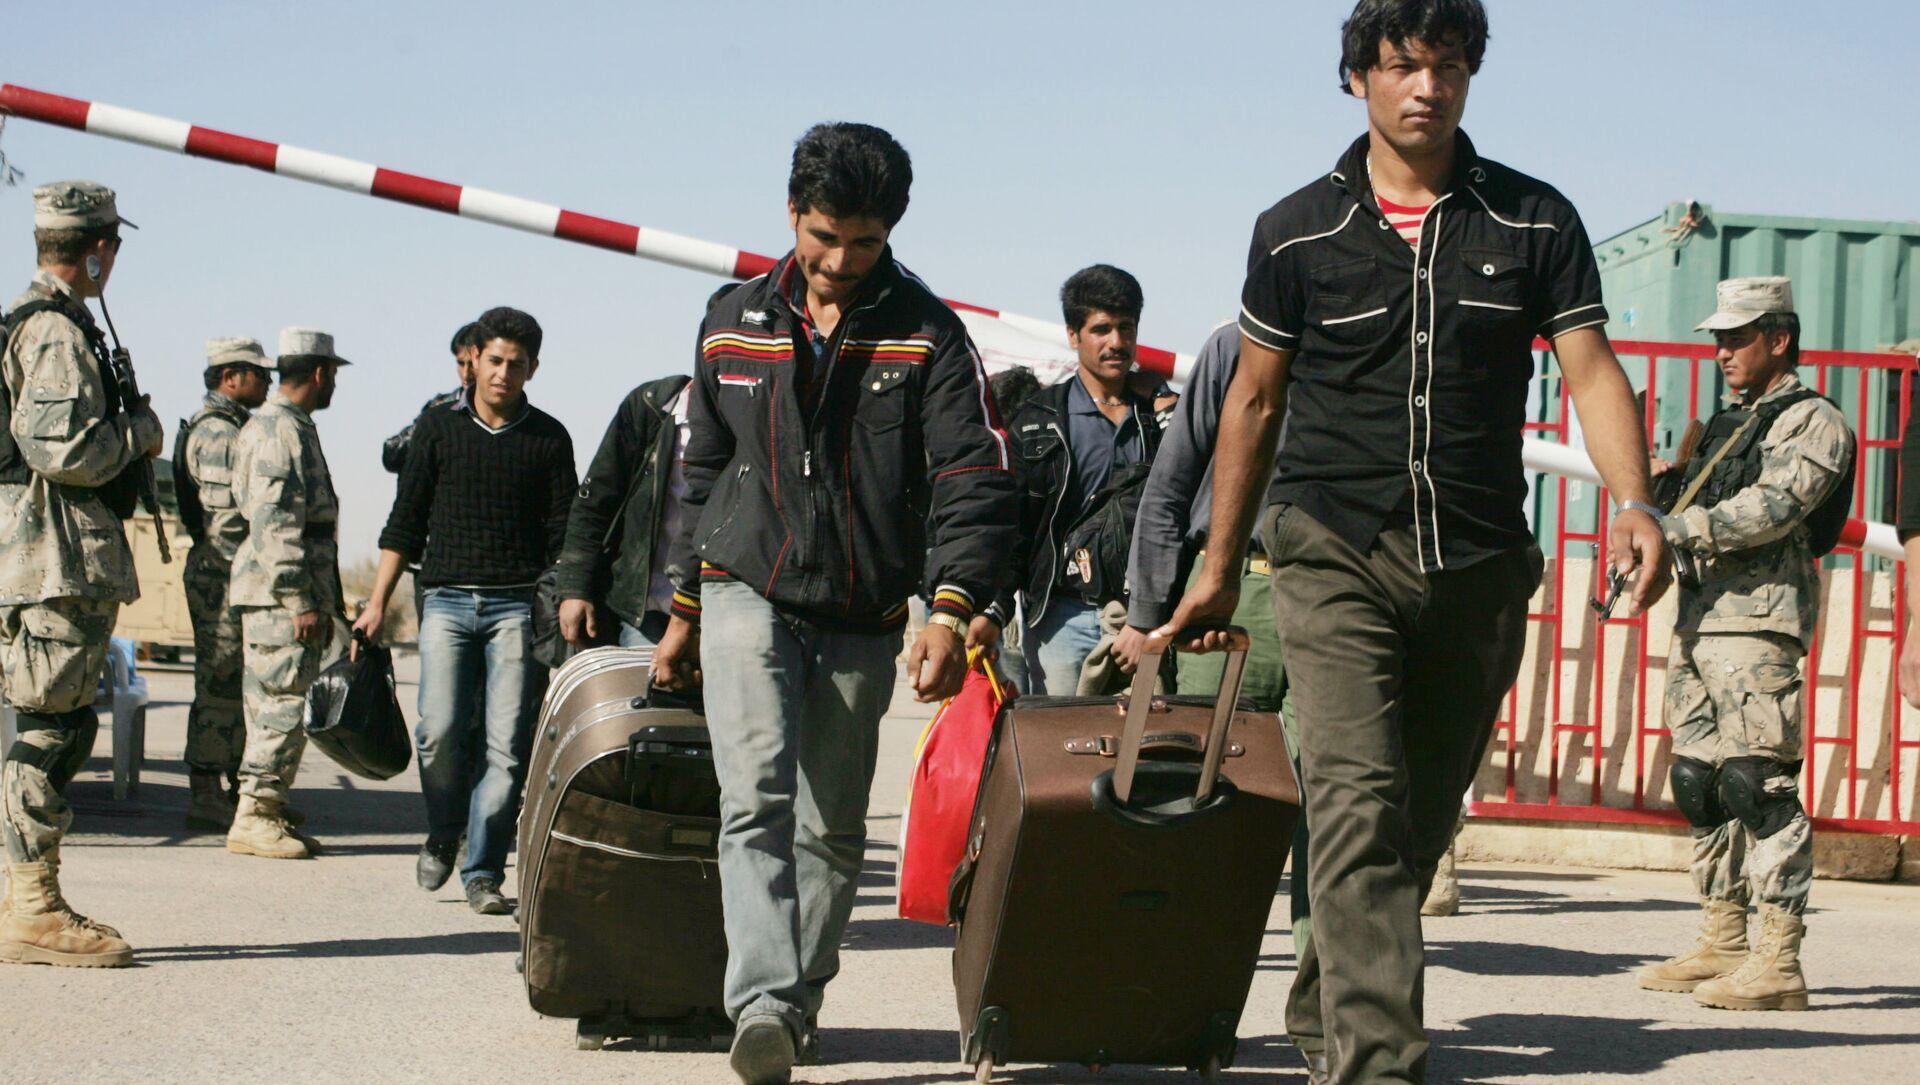 Afghan refugees enter Afghan territory after leaving Iran at the Islam Qala border crossing in Kohsan, Herat, west of Kabul, Afghanistan, Sunday, Nov.11, 2012 - Sputnik International, 1920, 05.08.2021